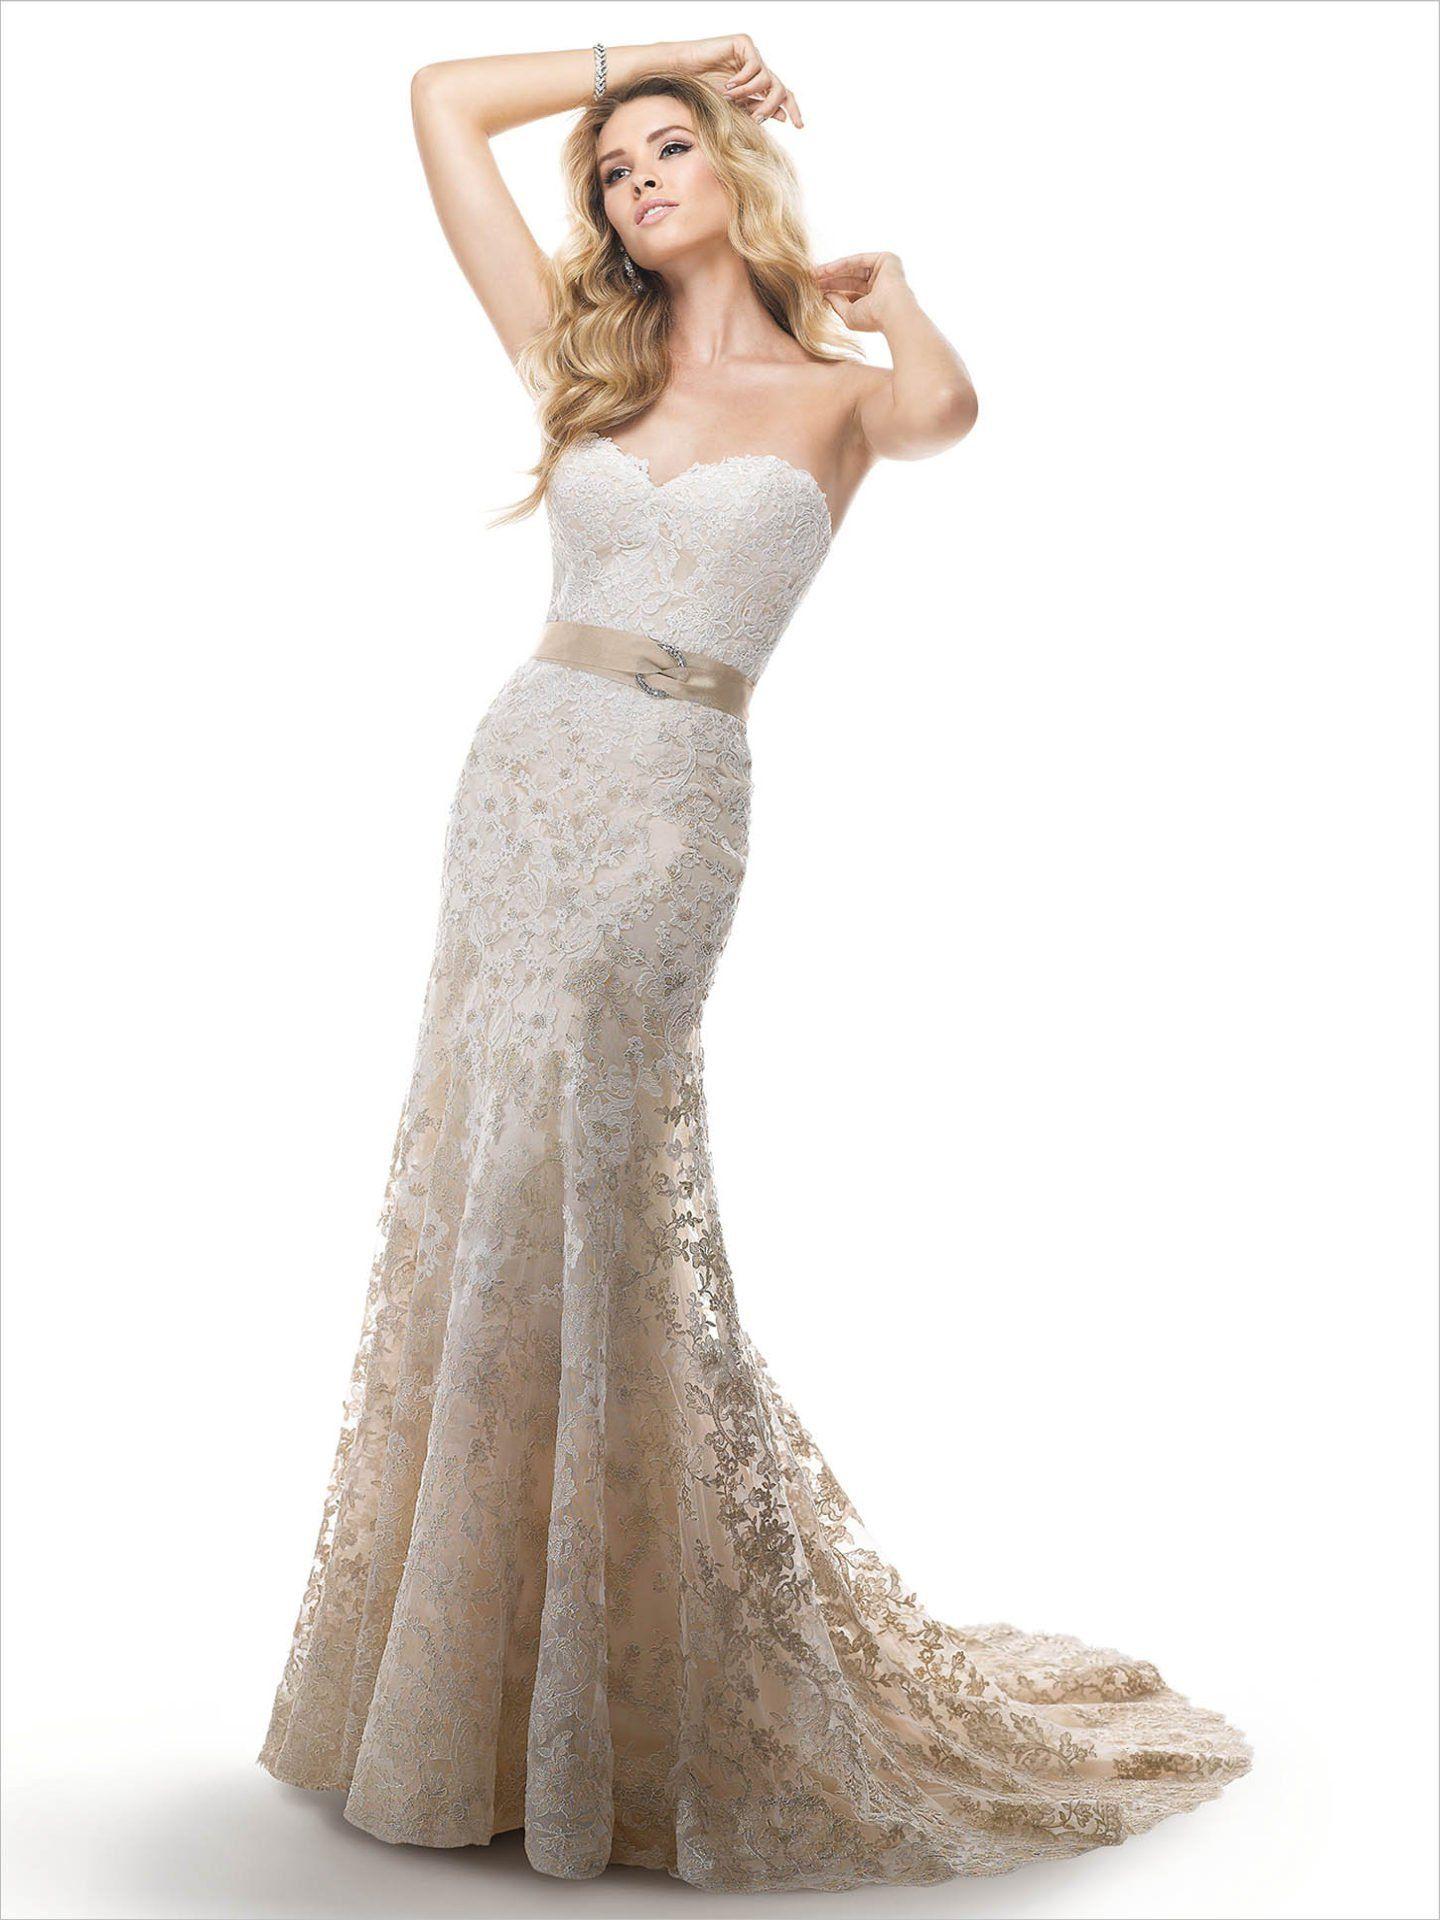 Britannia By Maggie Sottero Wedding Dresses Maggie Sottero Wedding Dresses Fit And Flare Wedding Dress Sottero Wedding Dress,Average Cost Of Wedding Dress Canada